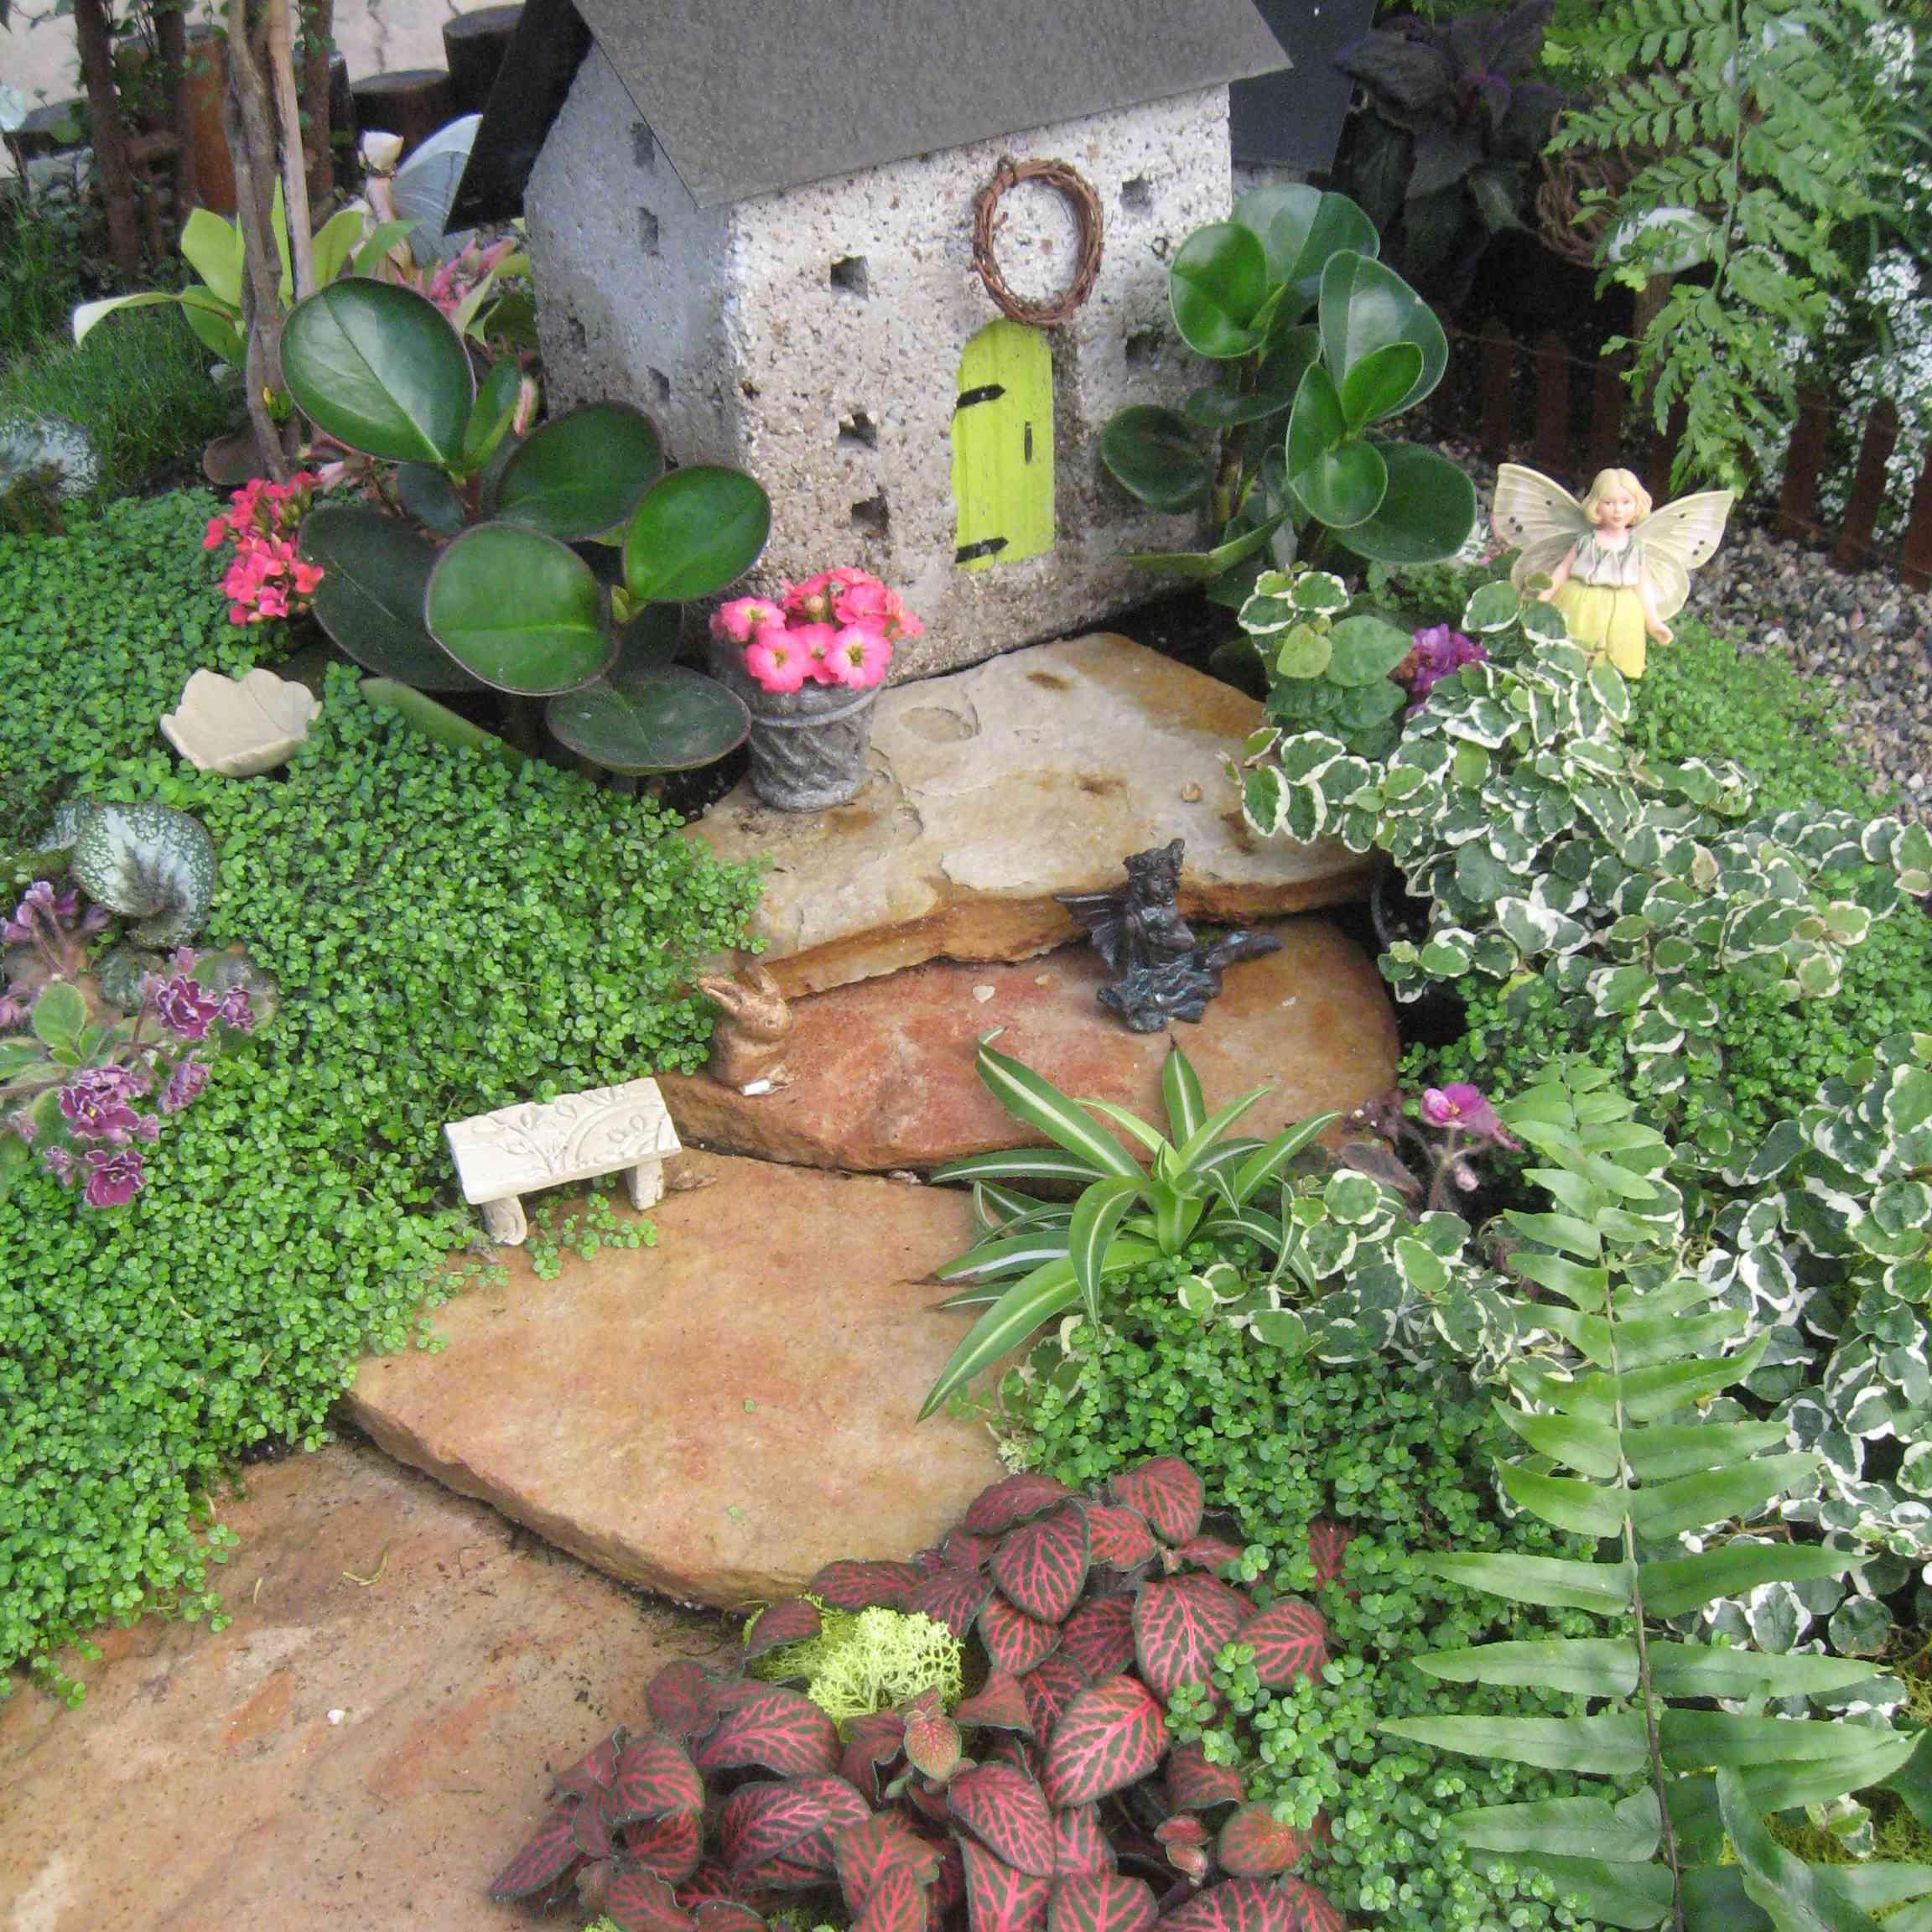 Miniature house in fairy garden.